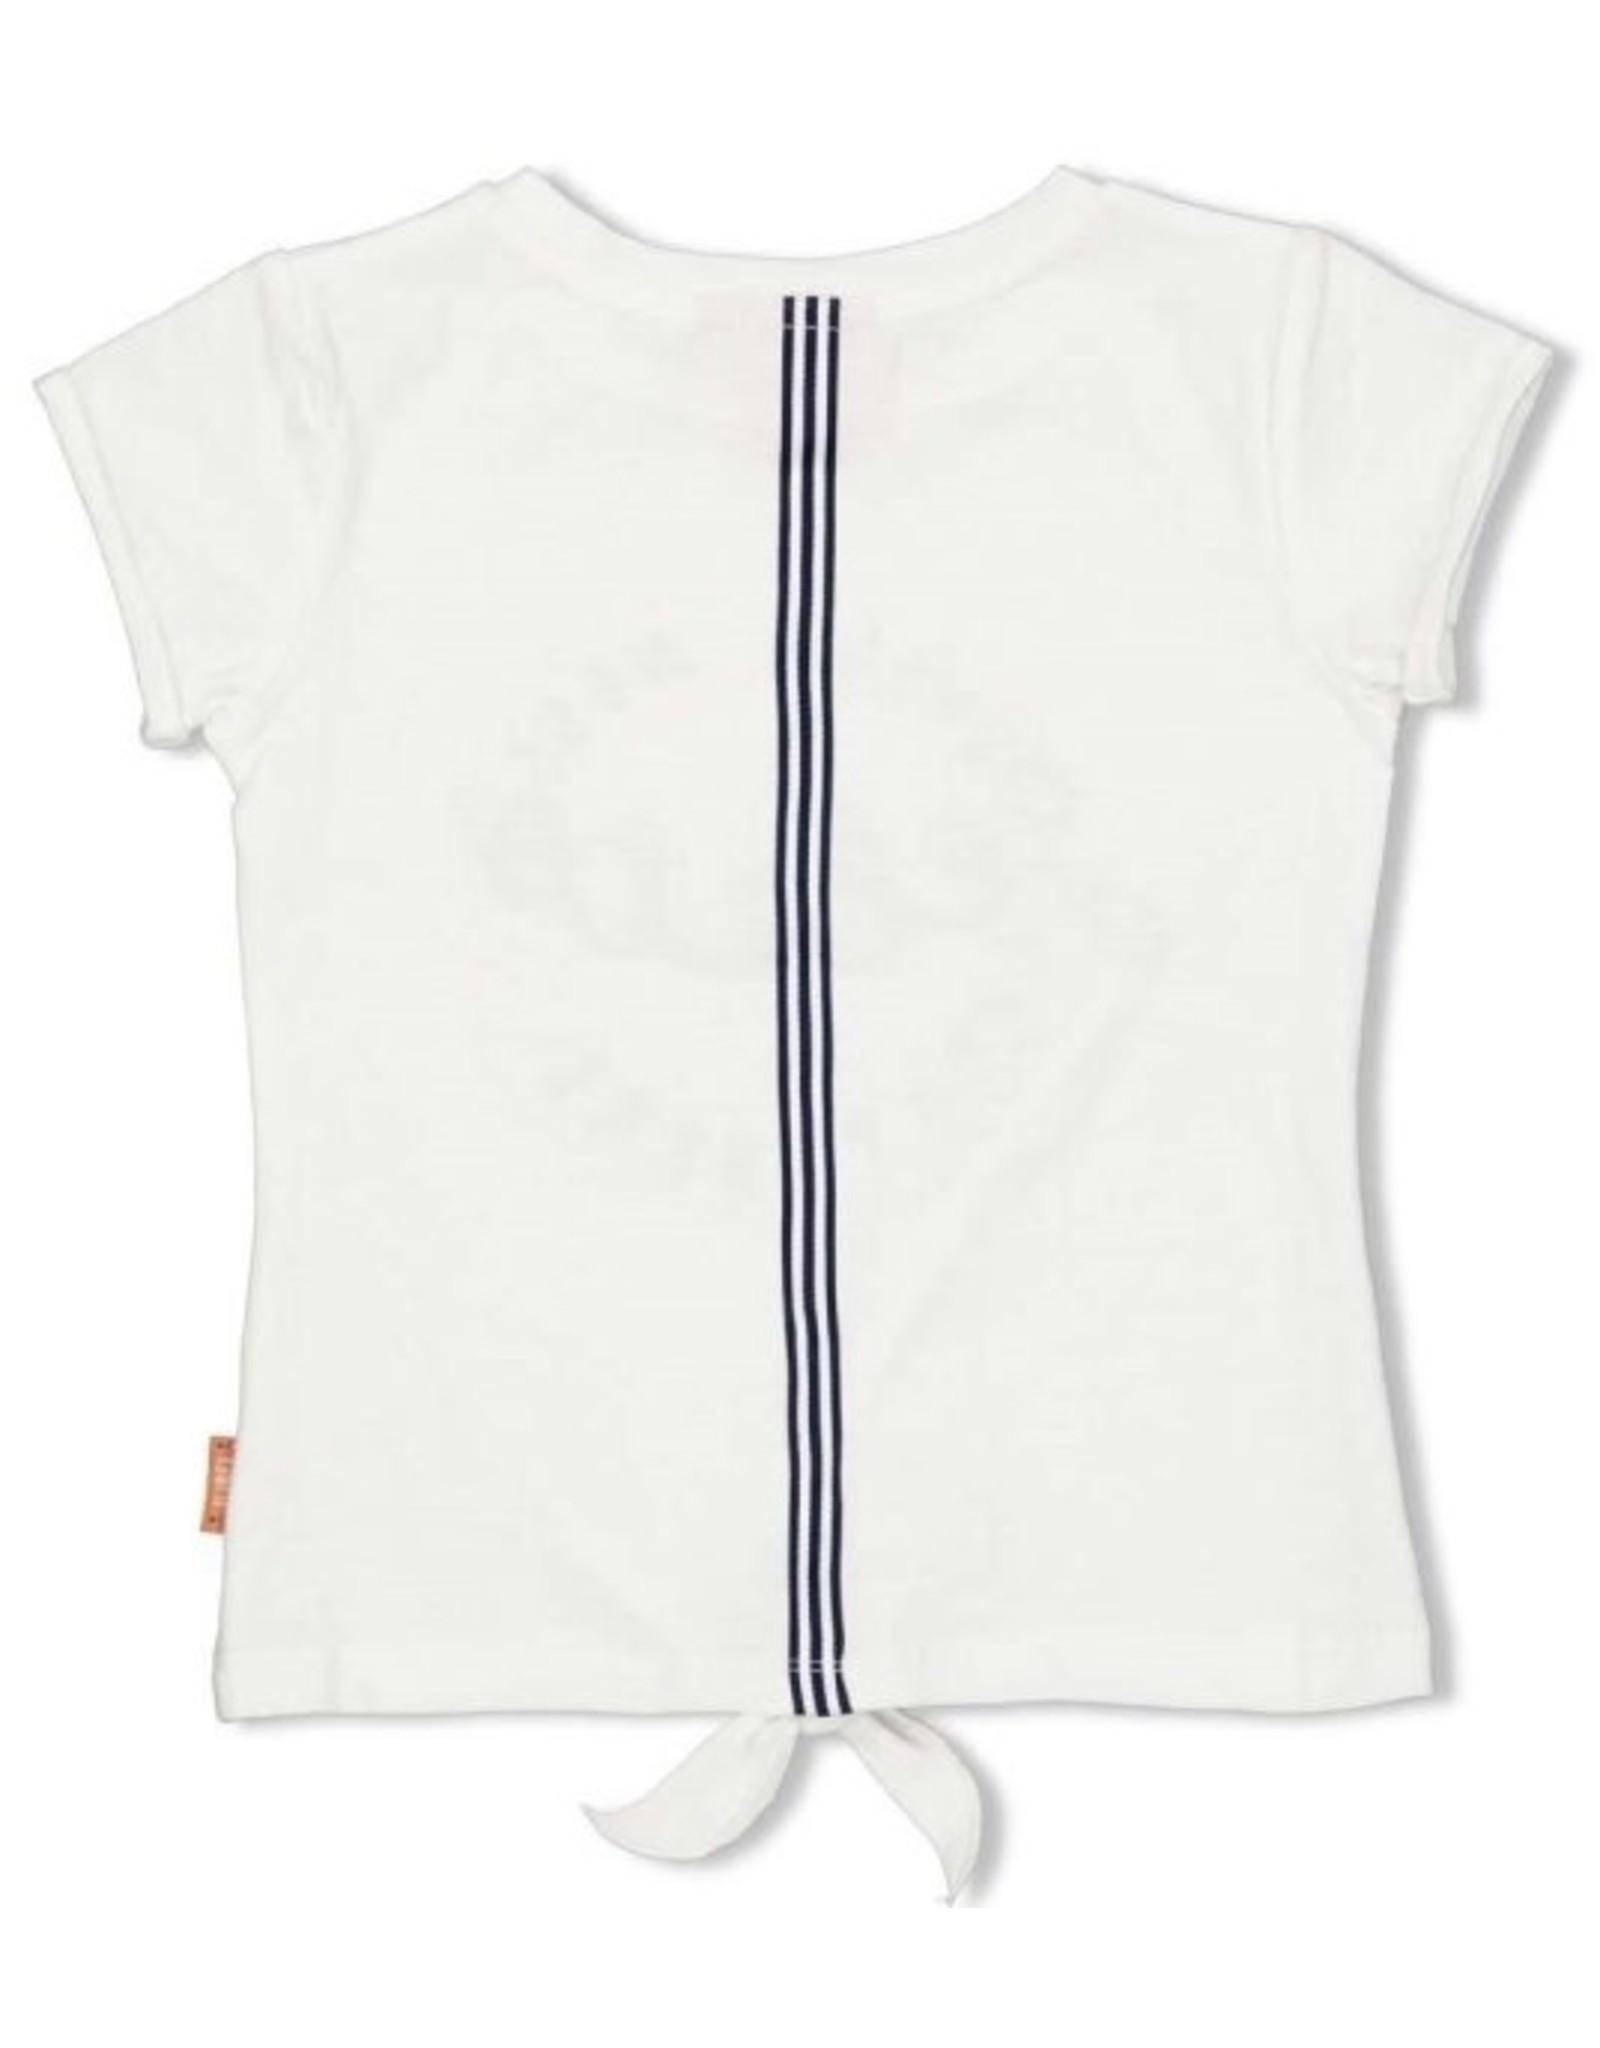 Jubel 91700293 T-Shirt